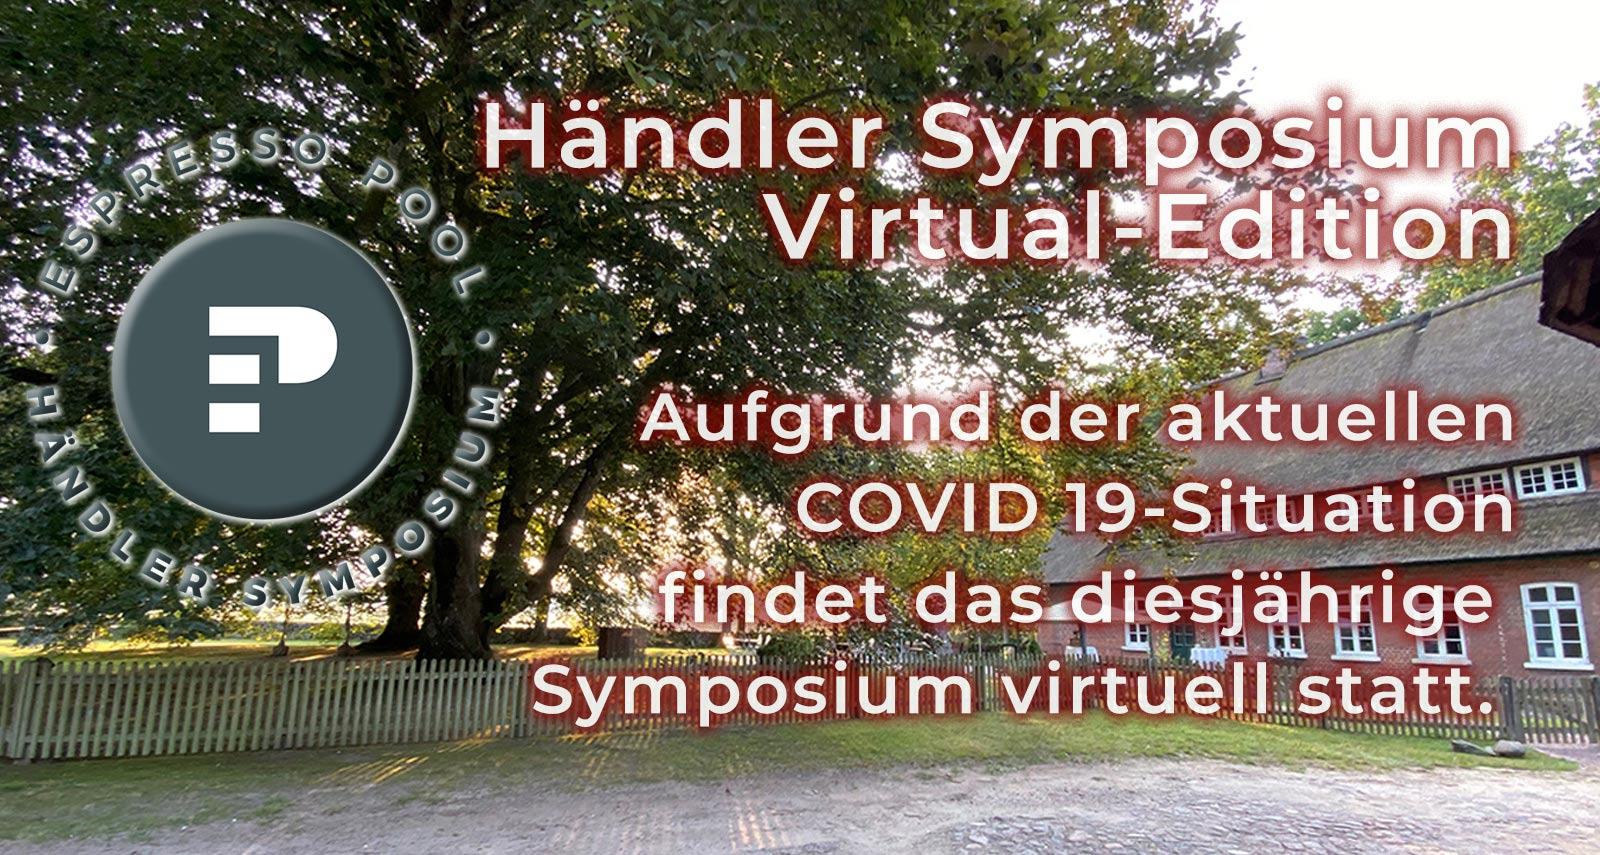 EspressoPool Händler Symposium 2020 – UPDATE